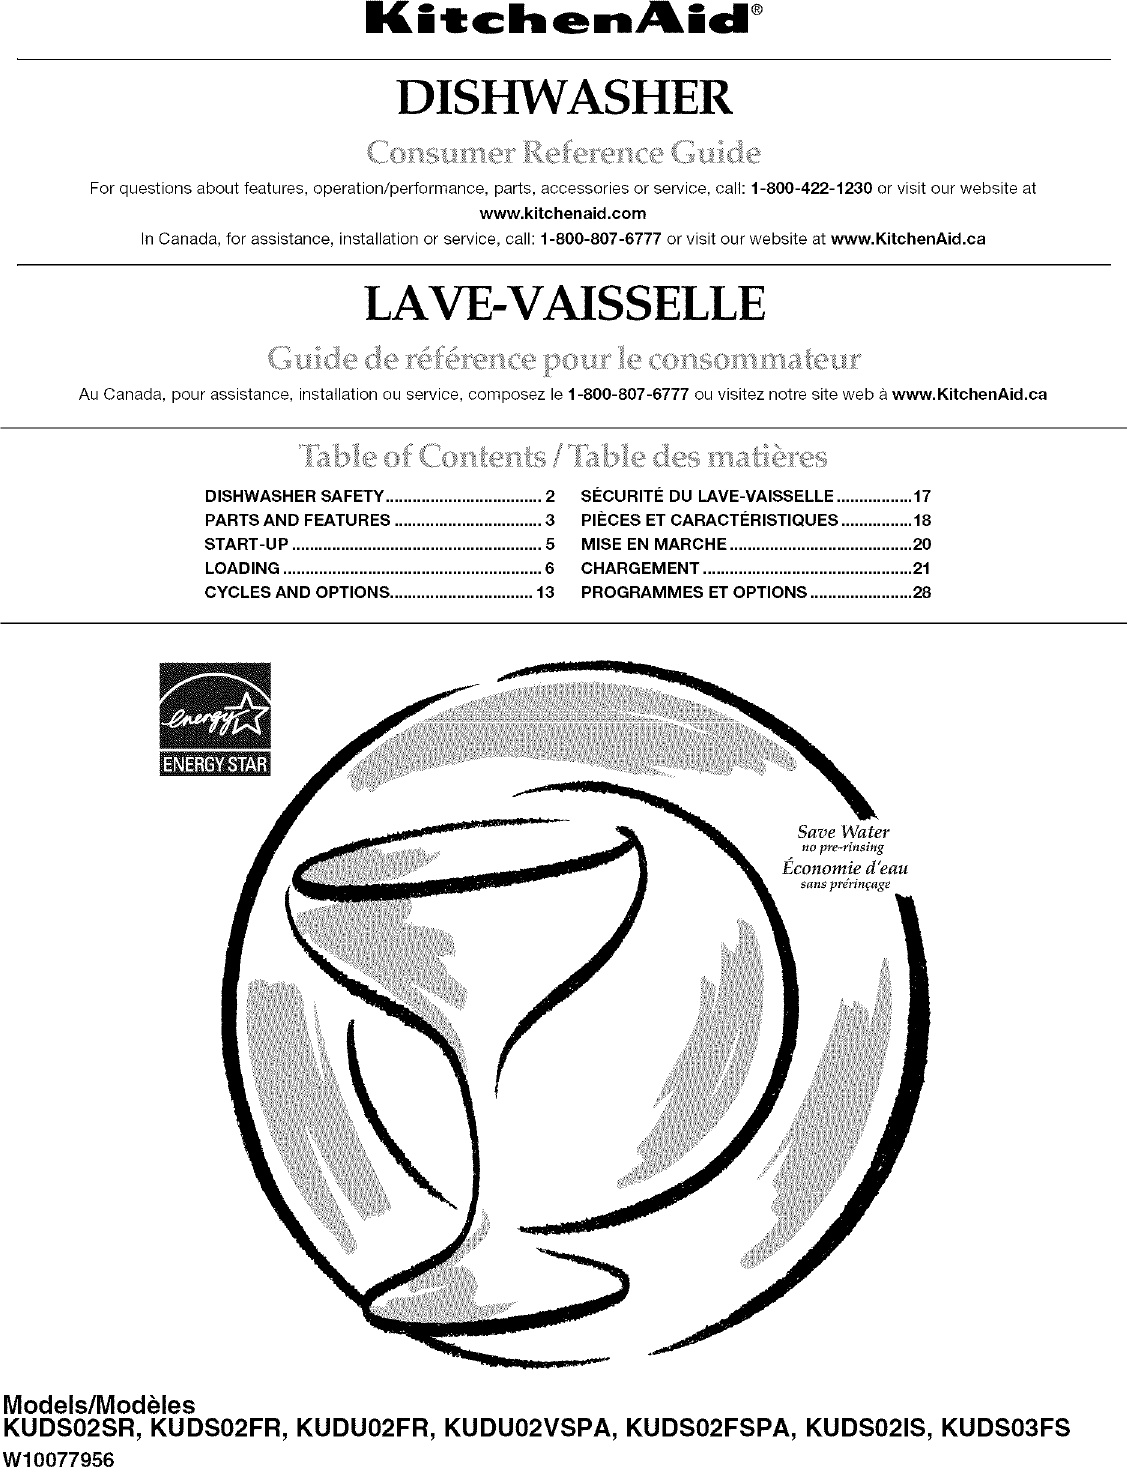 Kitchenaid Dishwasher Manual L0701319 Manual Guide